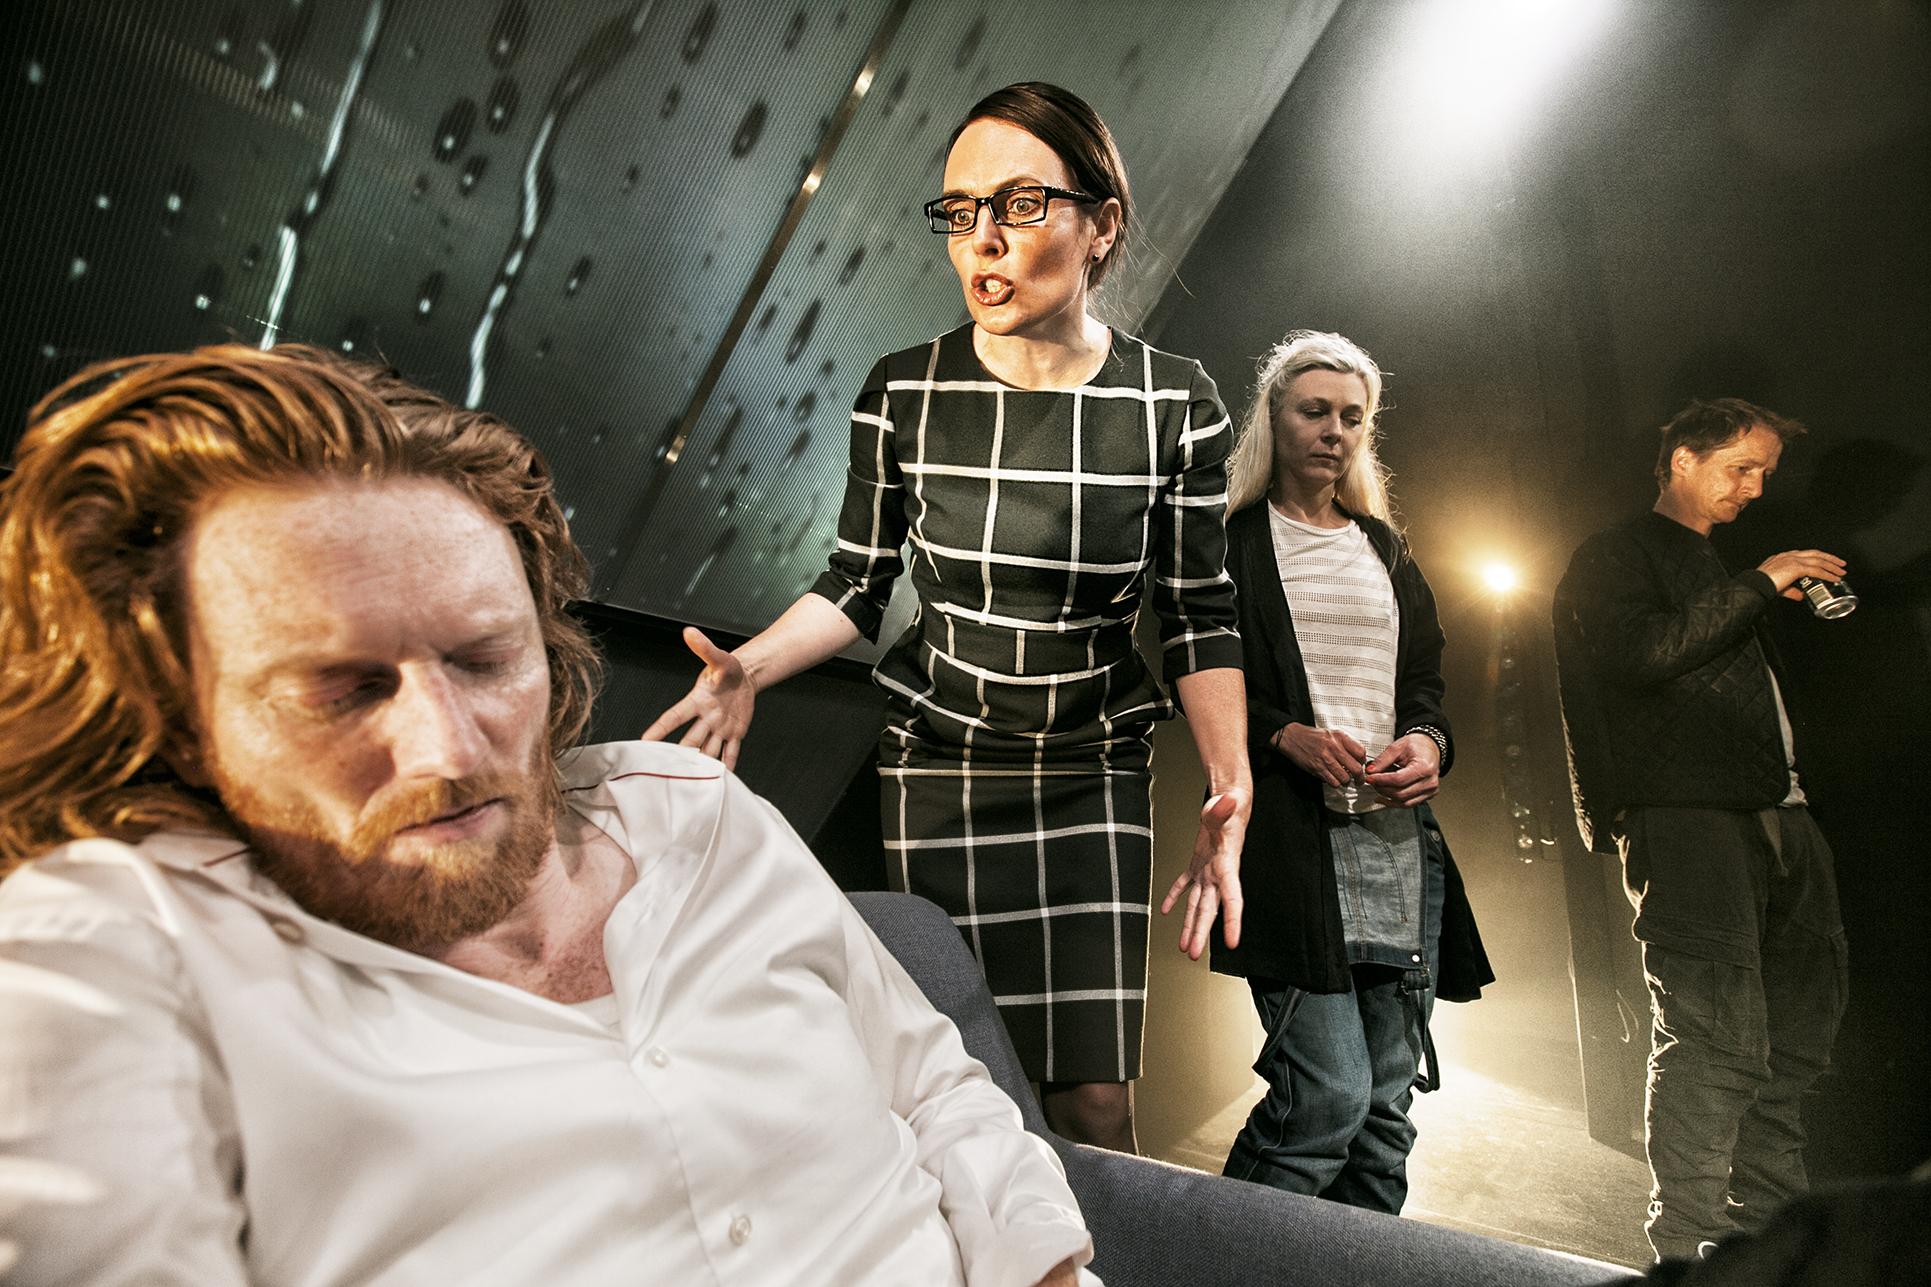 Nils P. Munk, Marianne Søndergaard, Betina Grove og Joen Højerslev  Foto: Per Morten Abrahamsen